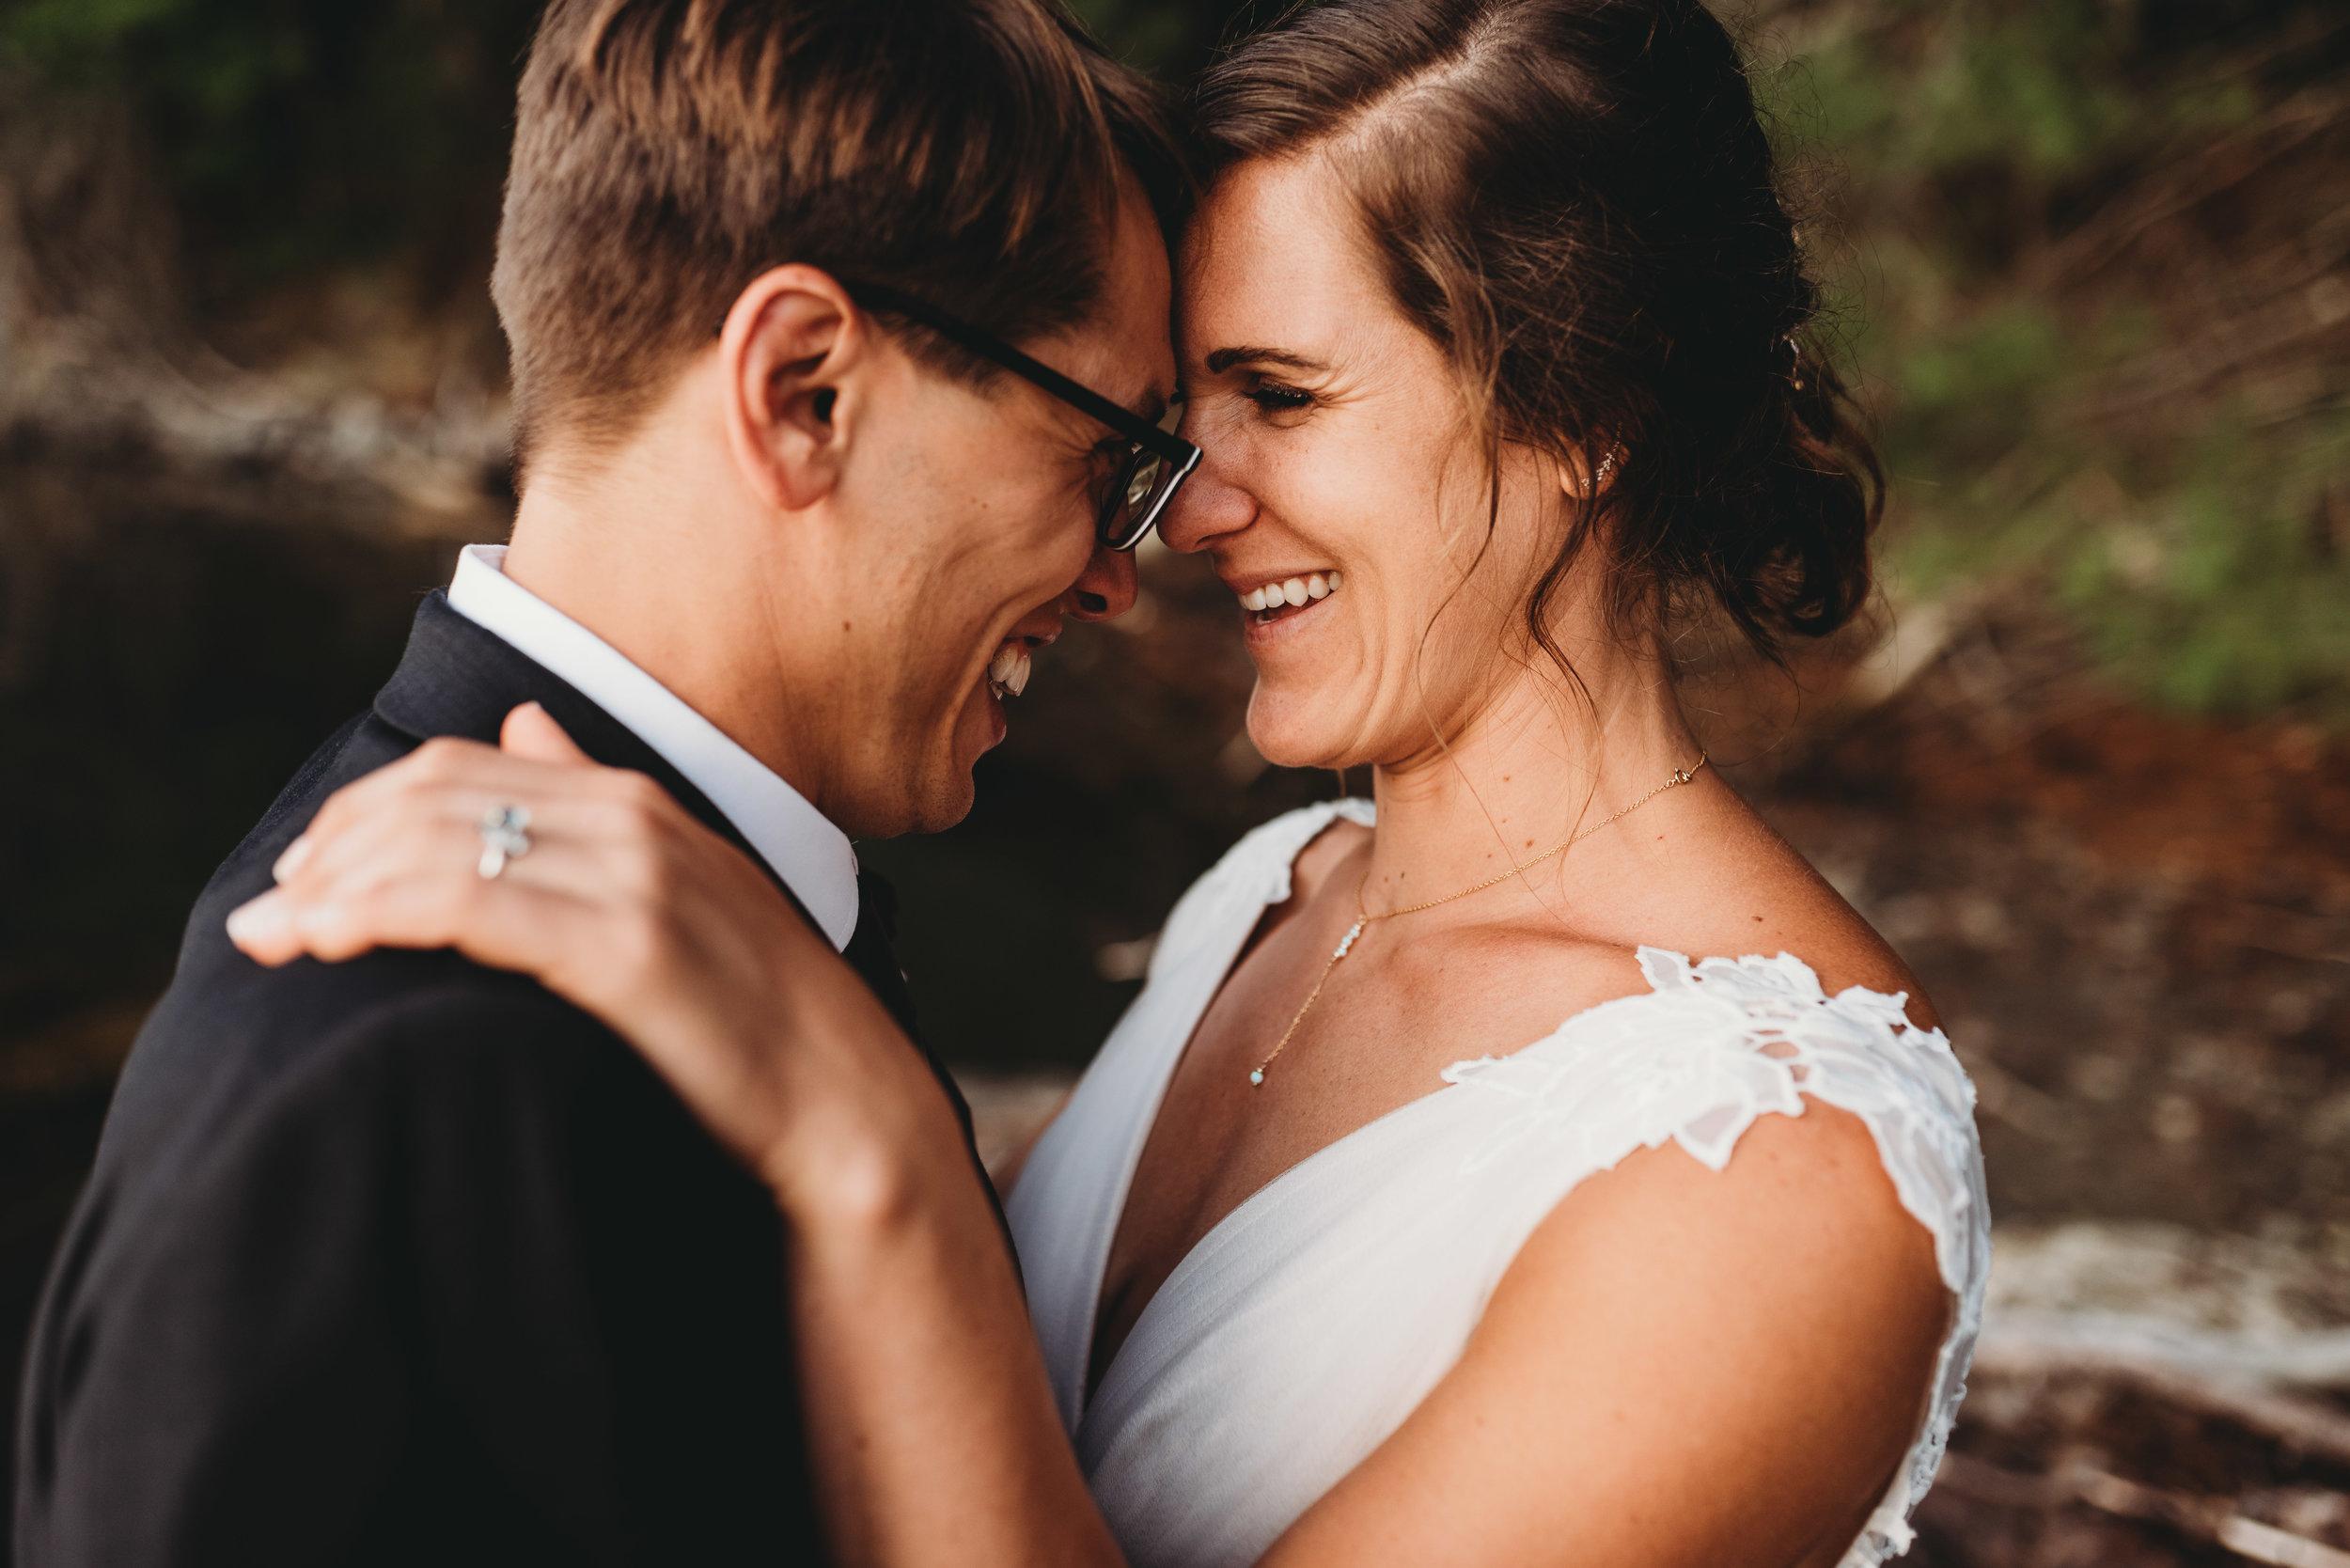 Shannon & Jason - South Bristol, Maine USA Wedding    27th July 2019